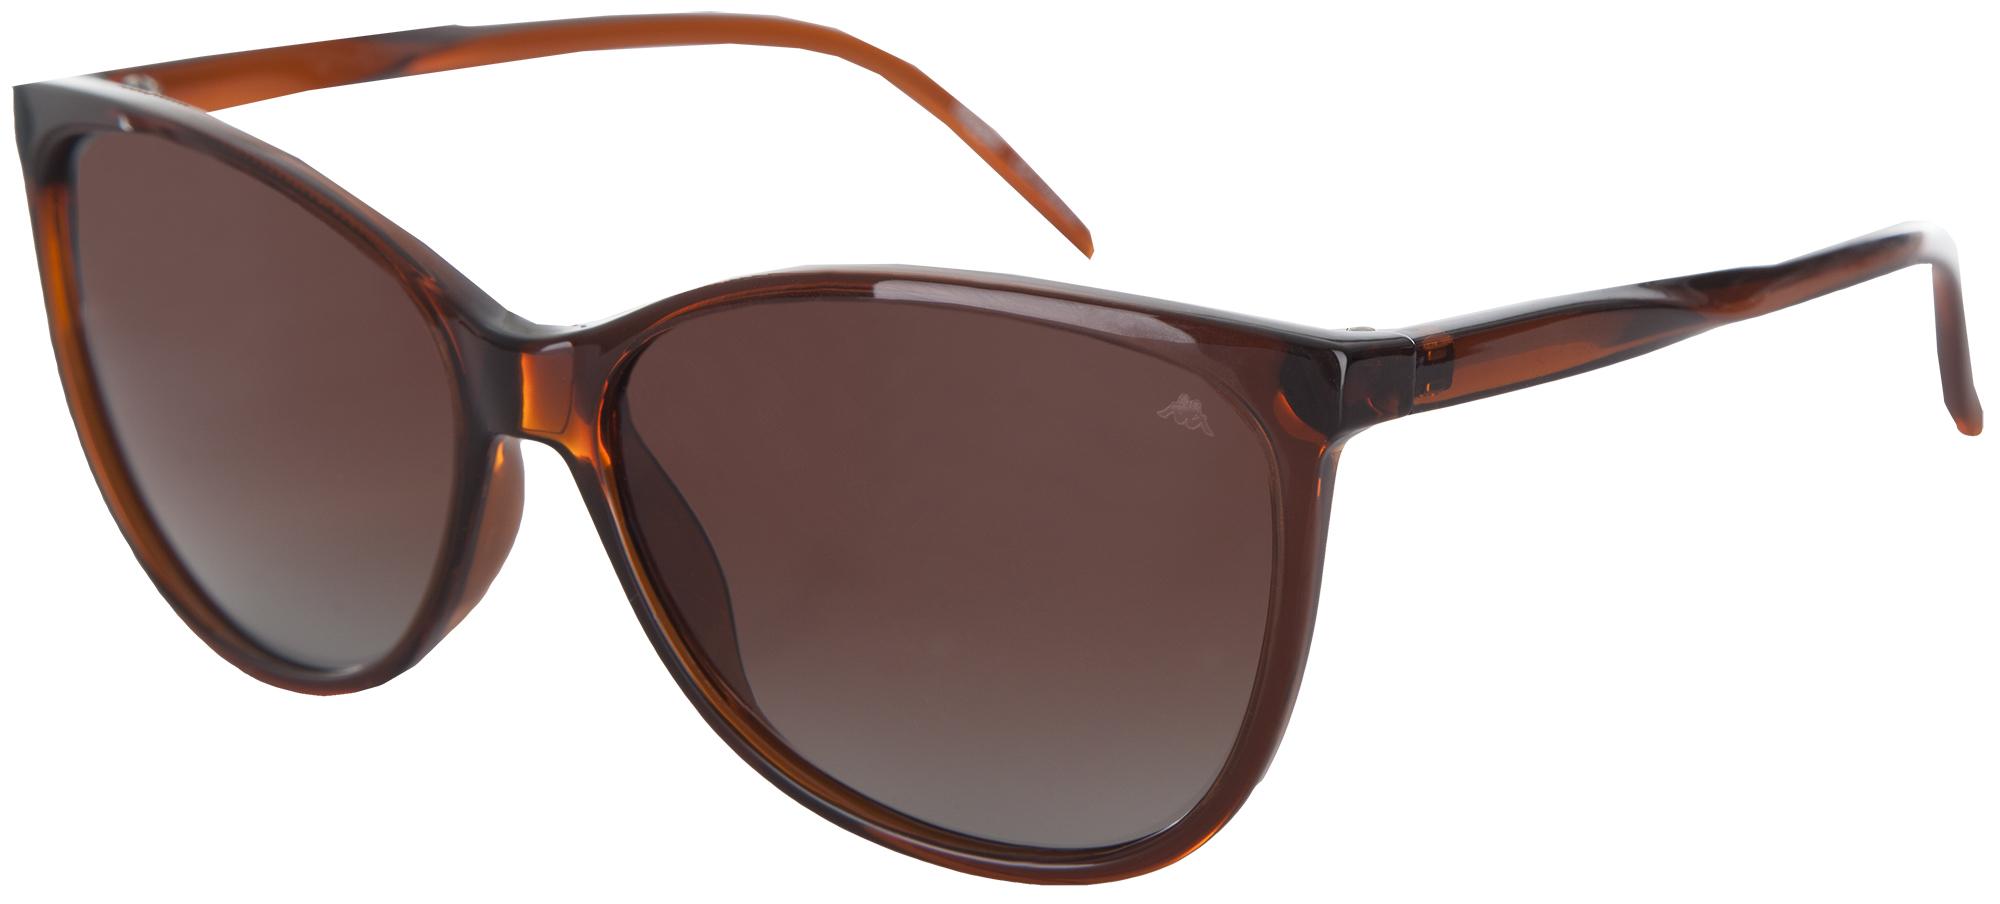 Kappa Солнцезащитные очки Kappa